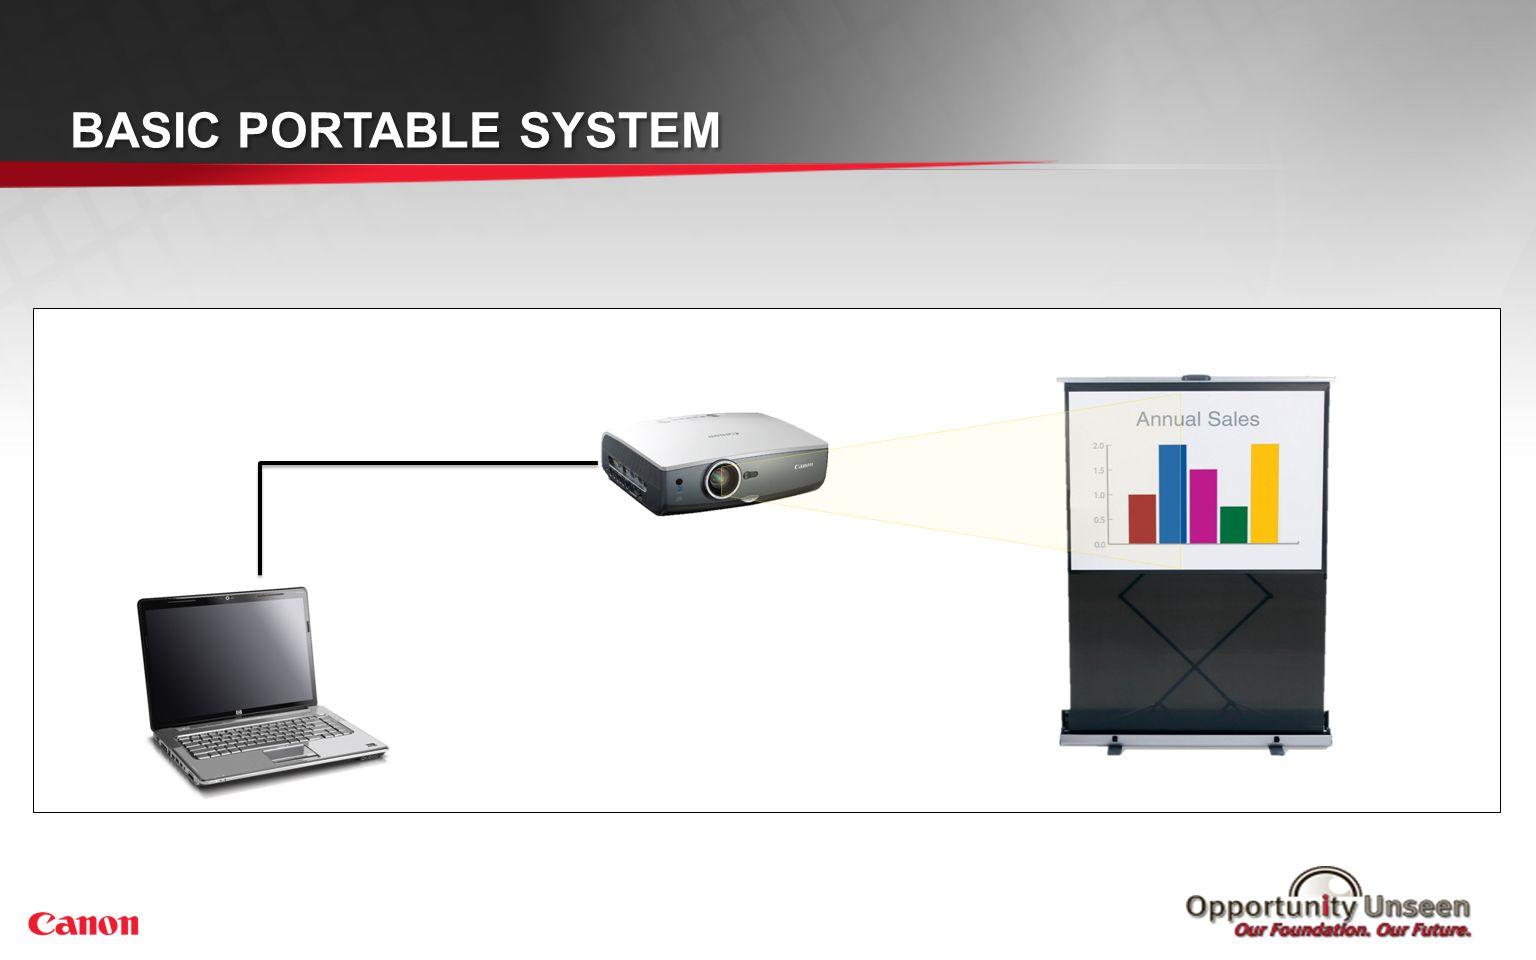 BASIC PORTABLE SYSTEM